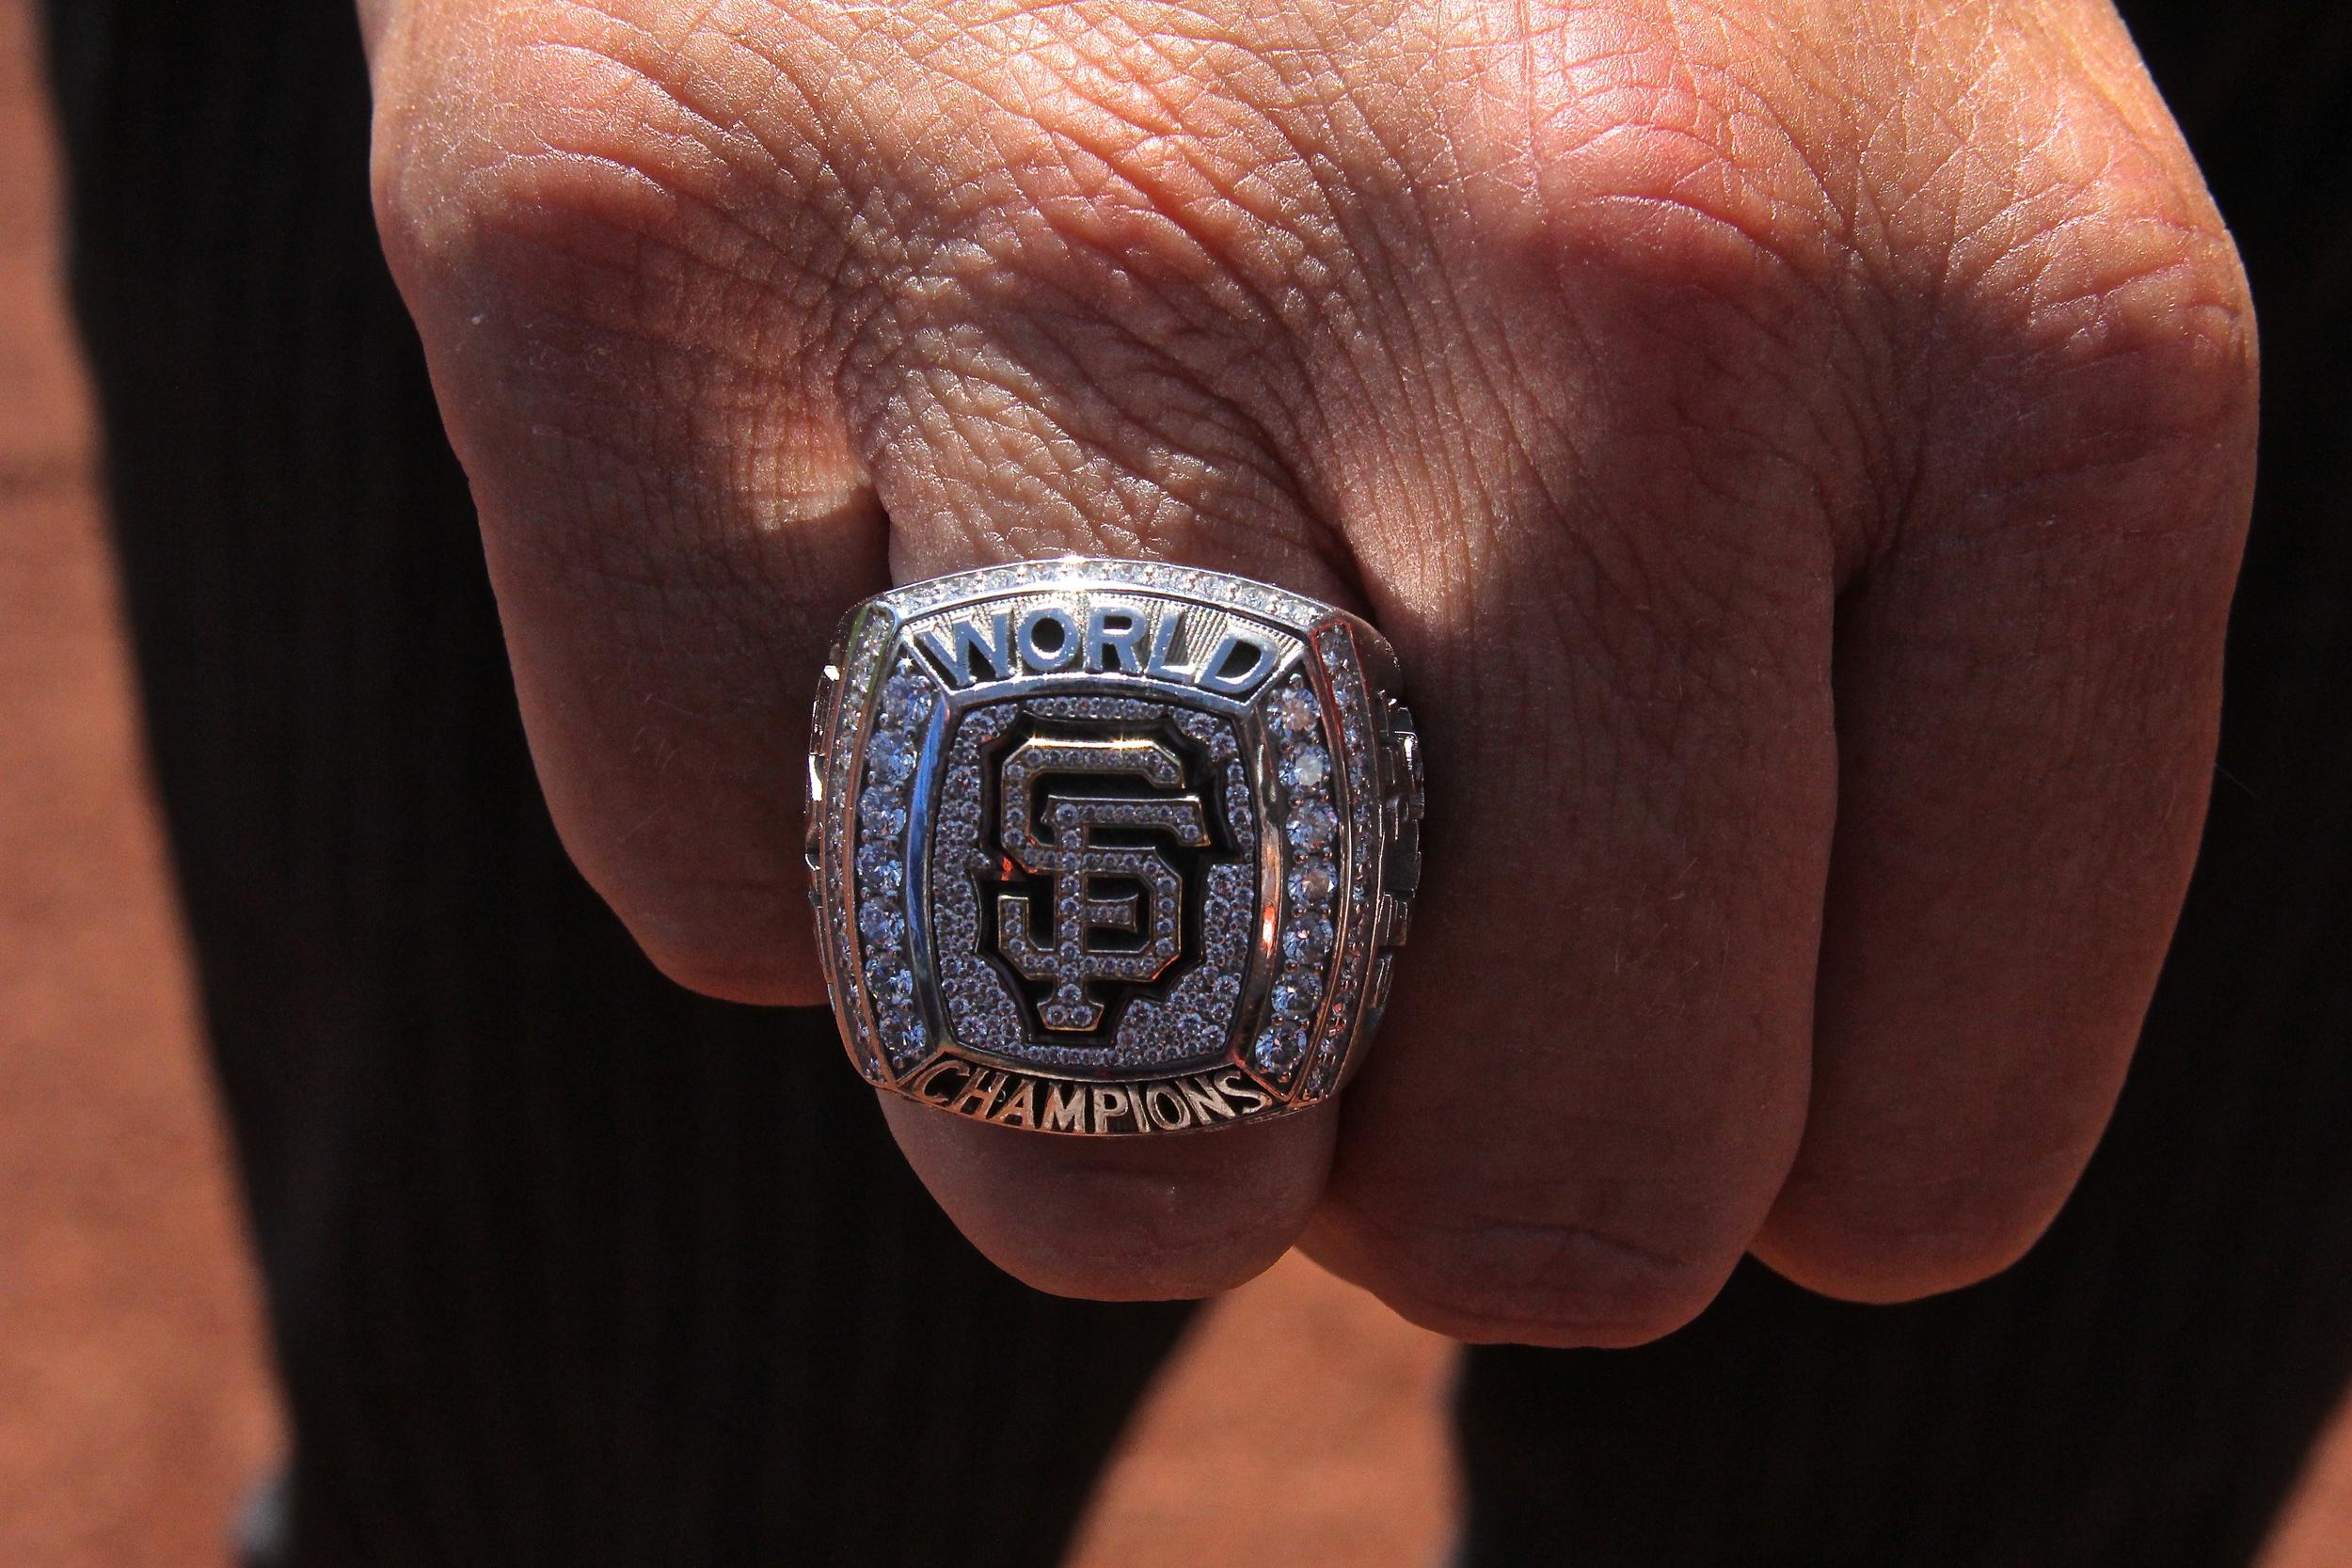 Jack's ring